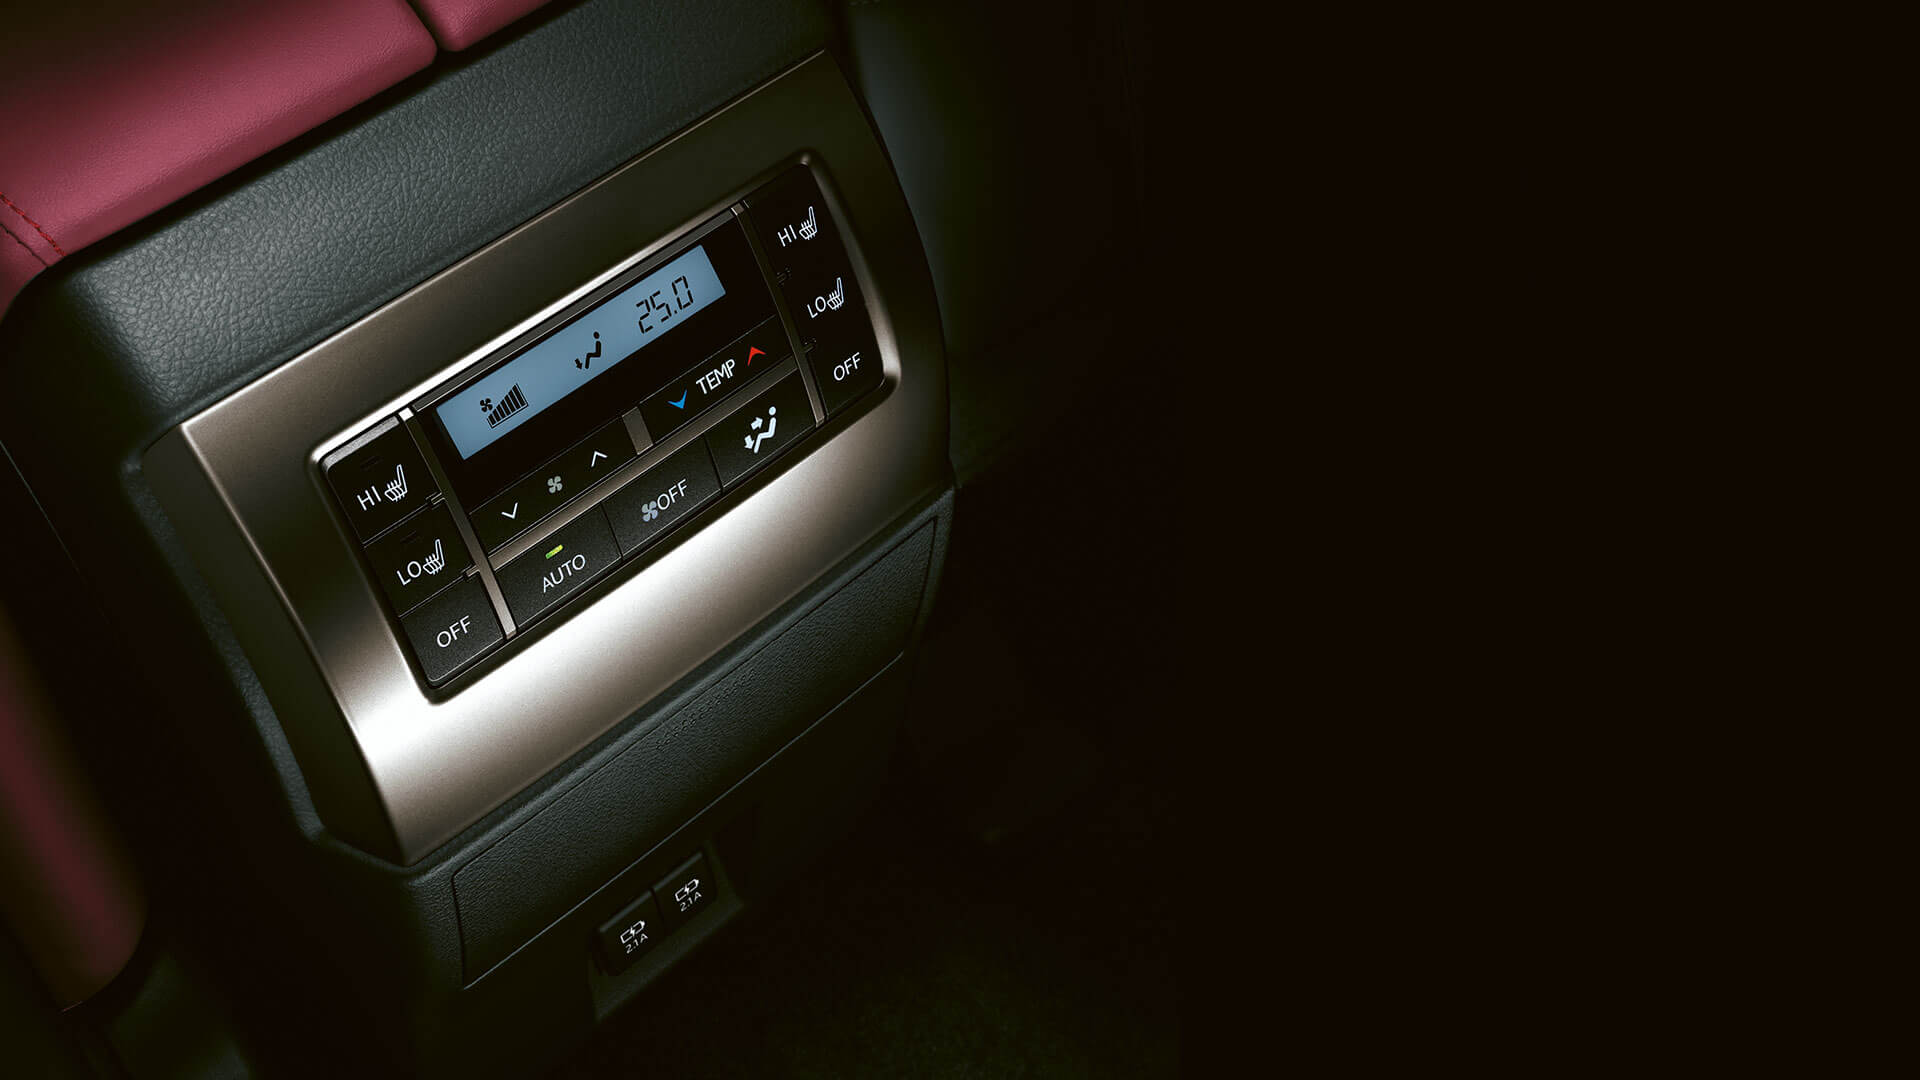 2019 lexus gx hotspot rear climate panel